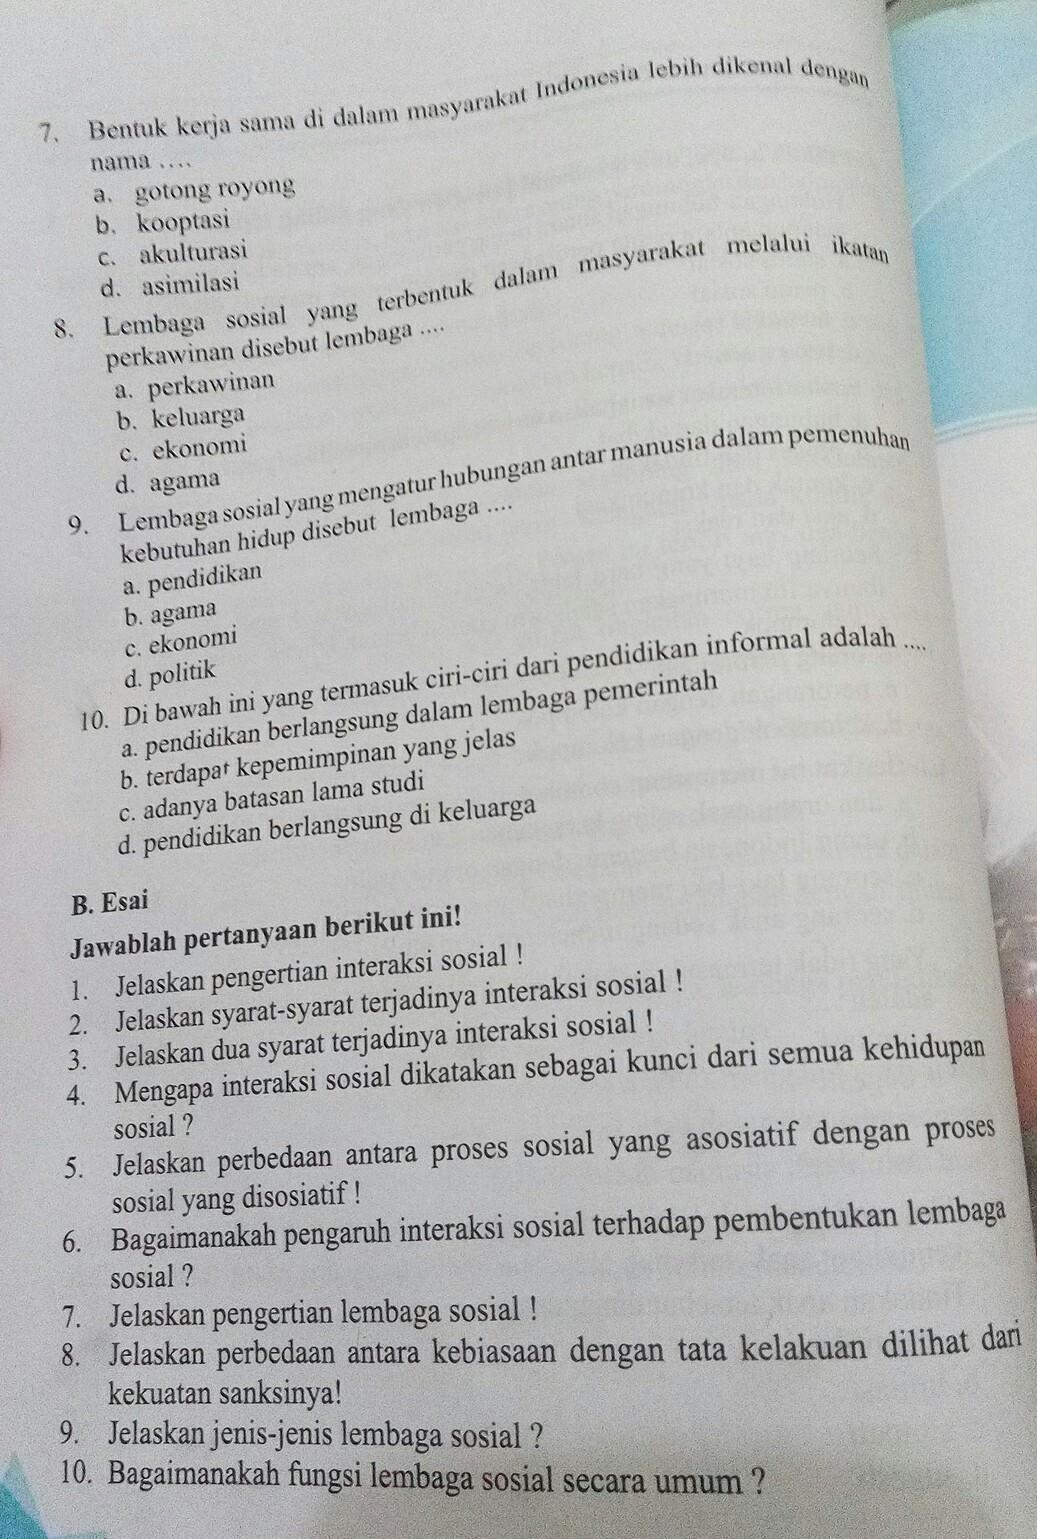 Bagaimana Fungsi Lembaga Sosial Secara Umum : bagaimana, fungsi, lembaga, sosial, secara, Tolong, Dijawab, Nomor, Pilihan, Berganda, Brainly.co.id